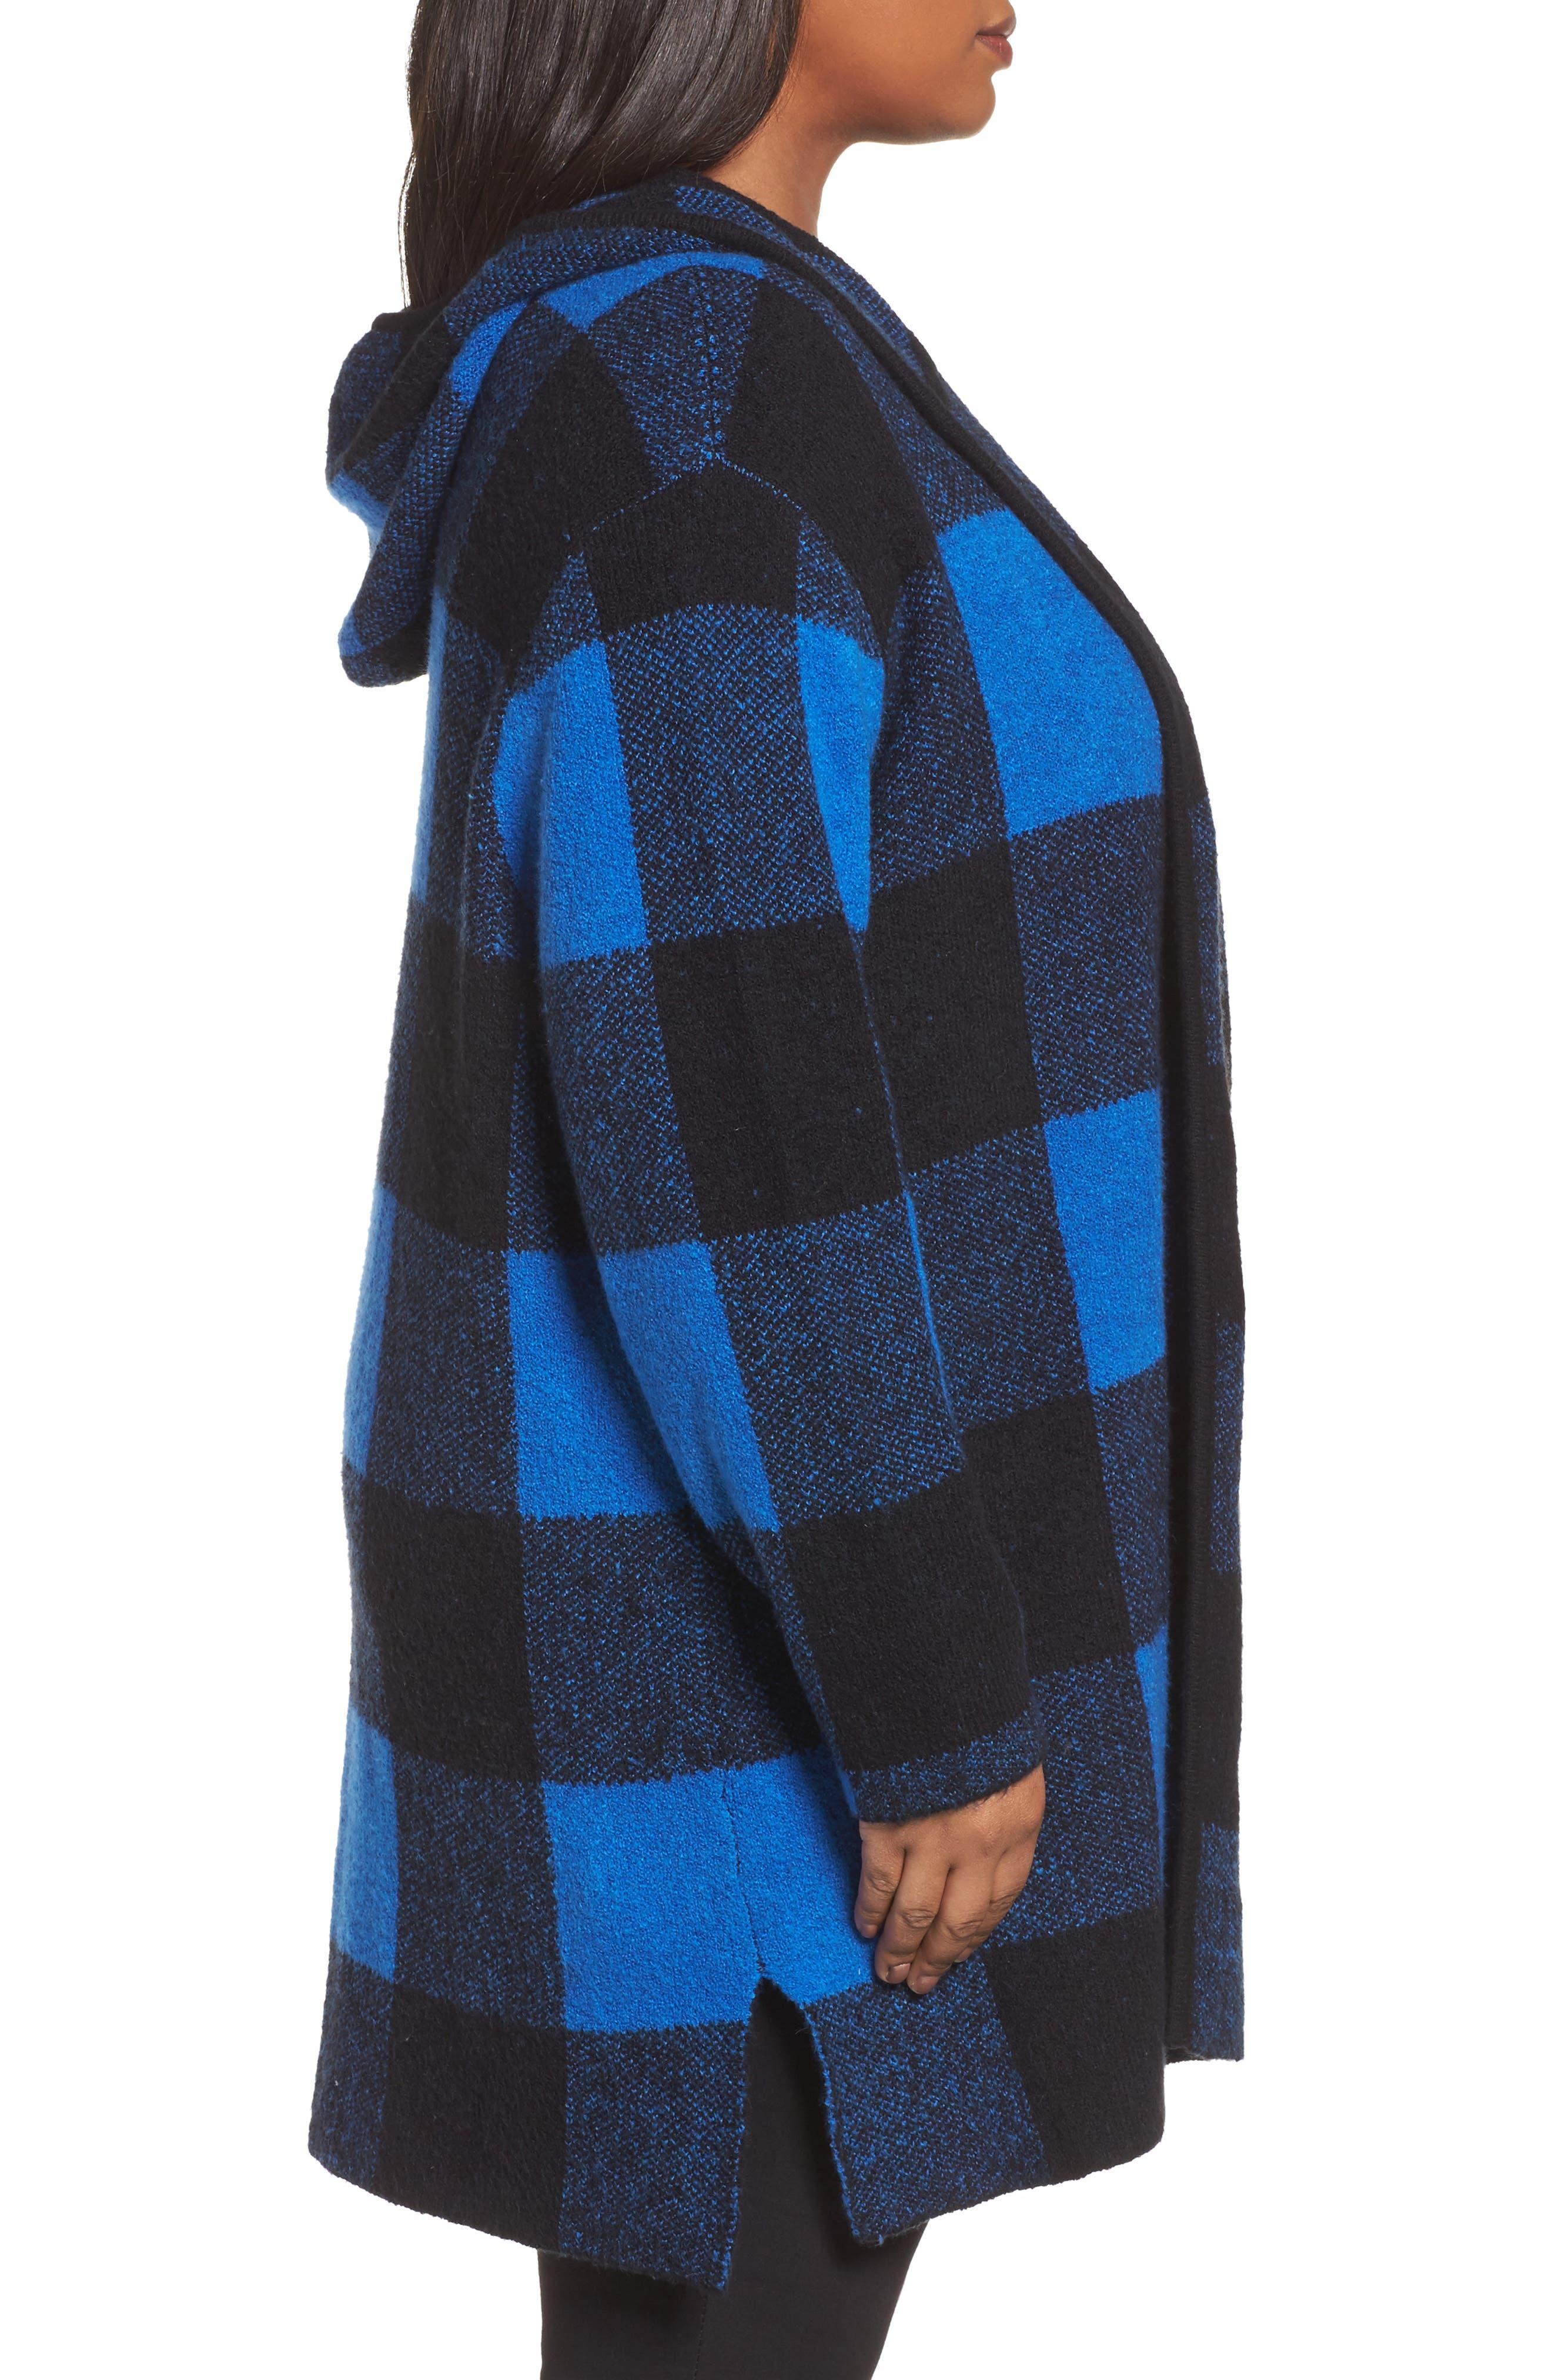 Plaid Hooded Sweater Coatigan,                             Alternate thumbnail 3, color,                             Blue Checkerboard Jacquard